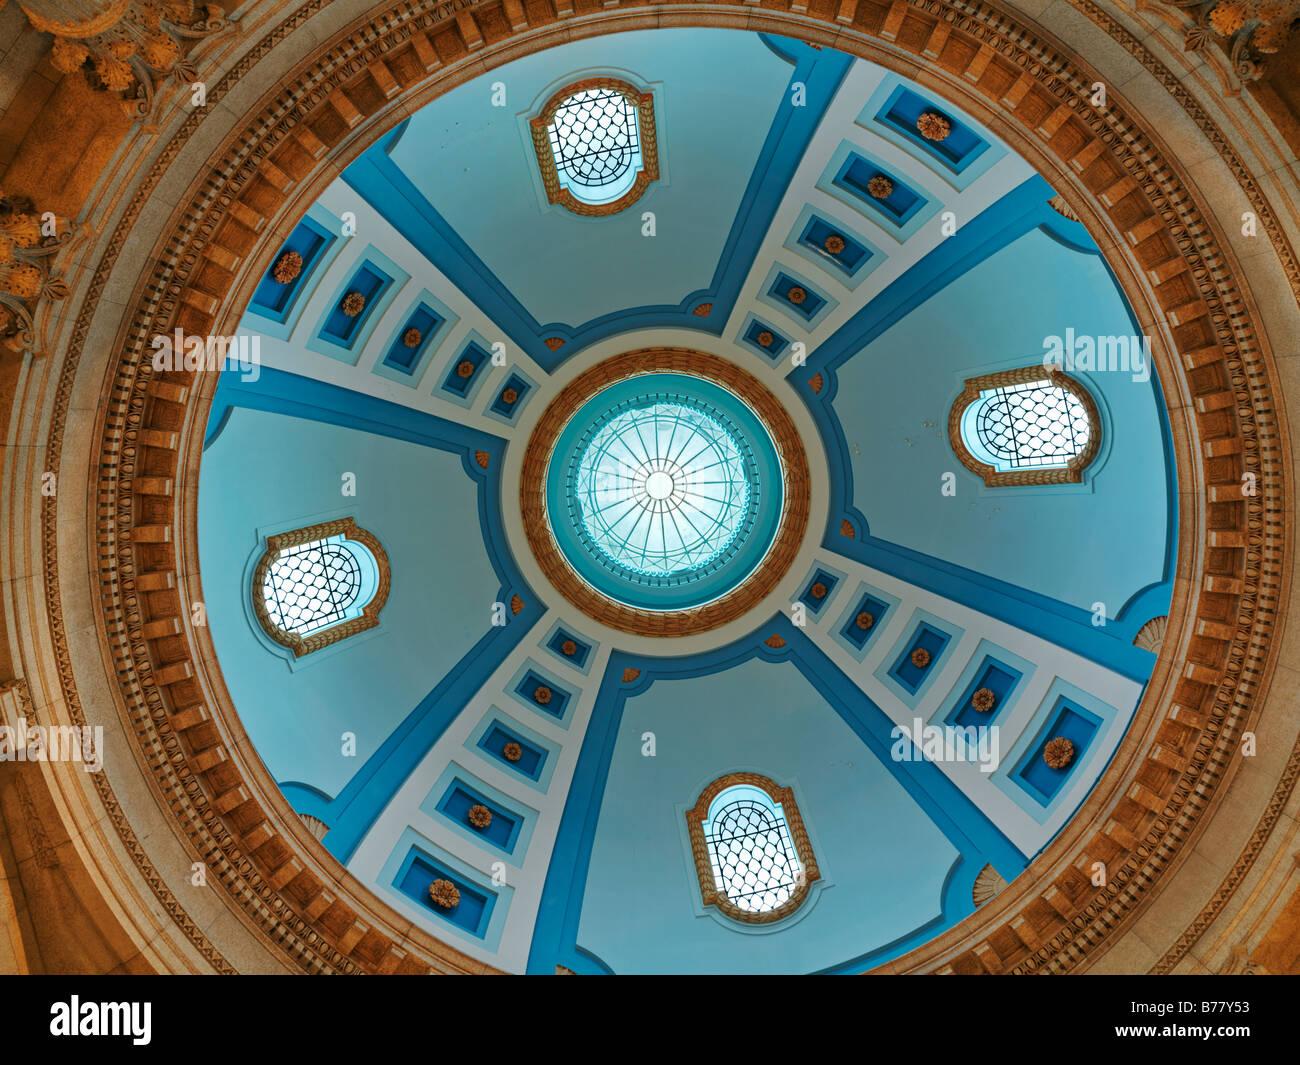 Canada,Manitoba,Winnipeg,Manitoba Legislative Building interior view looking up into the cupola - Stock Image